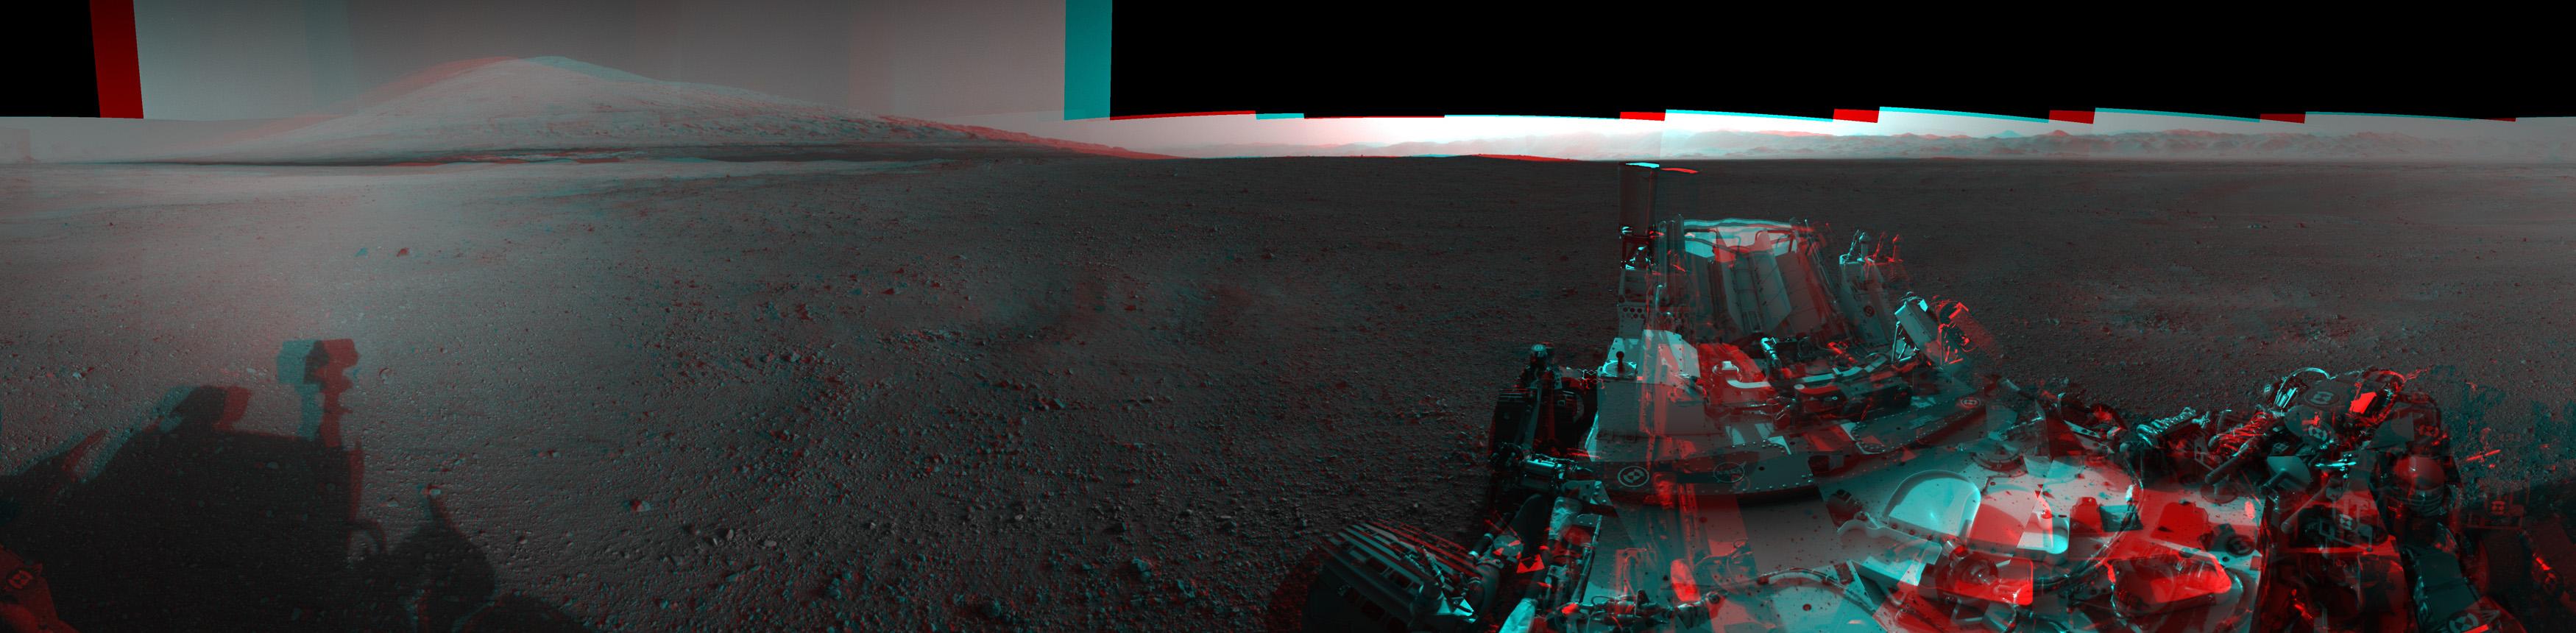 nasa brings mars landing to viewers everywhere - photo #18